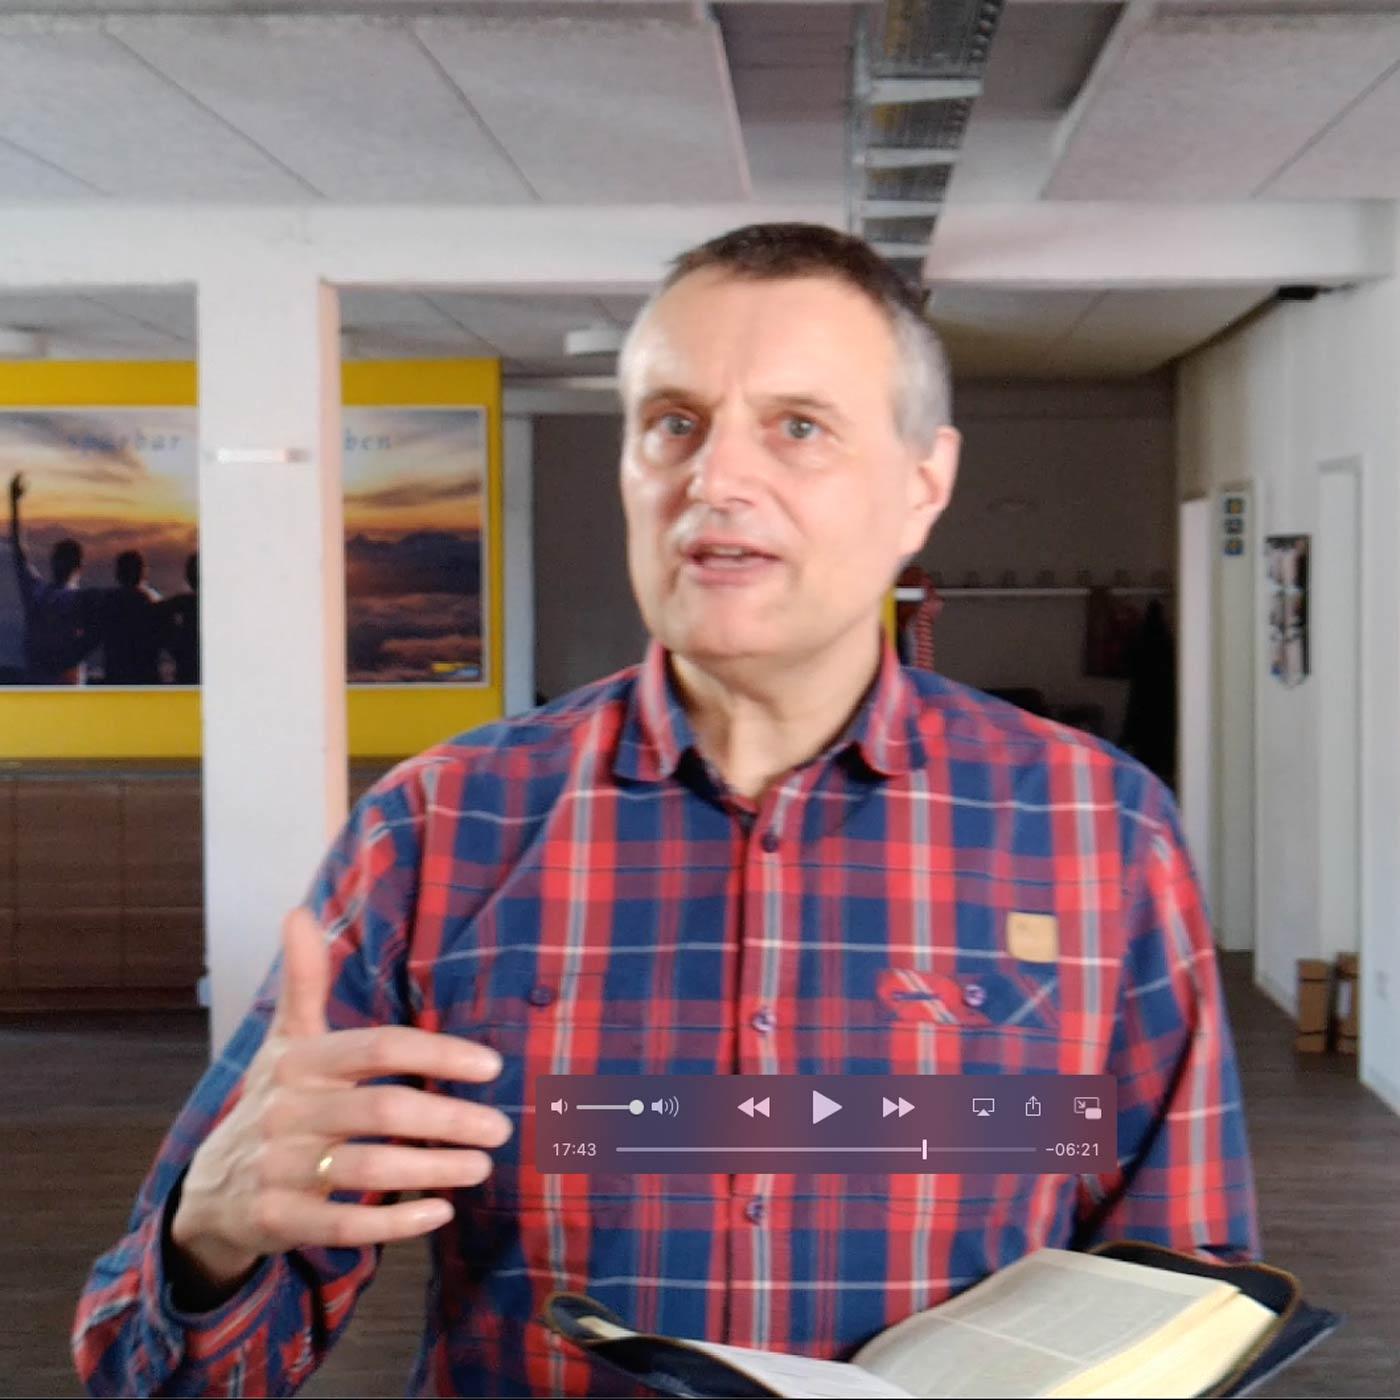 Videopredigt 2020-03-18_1080